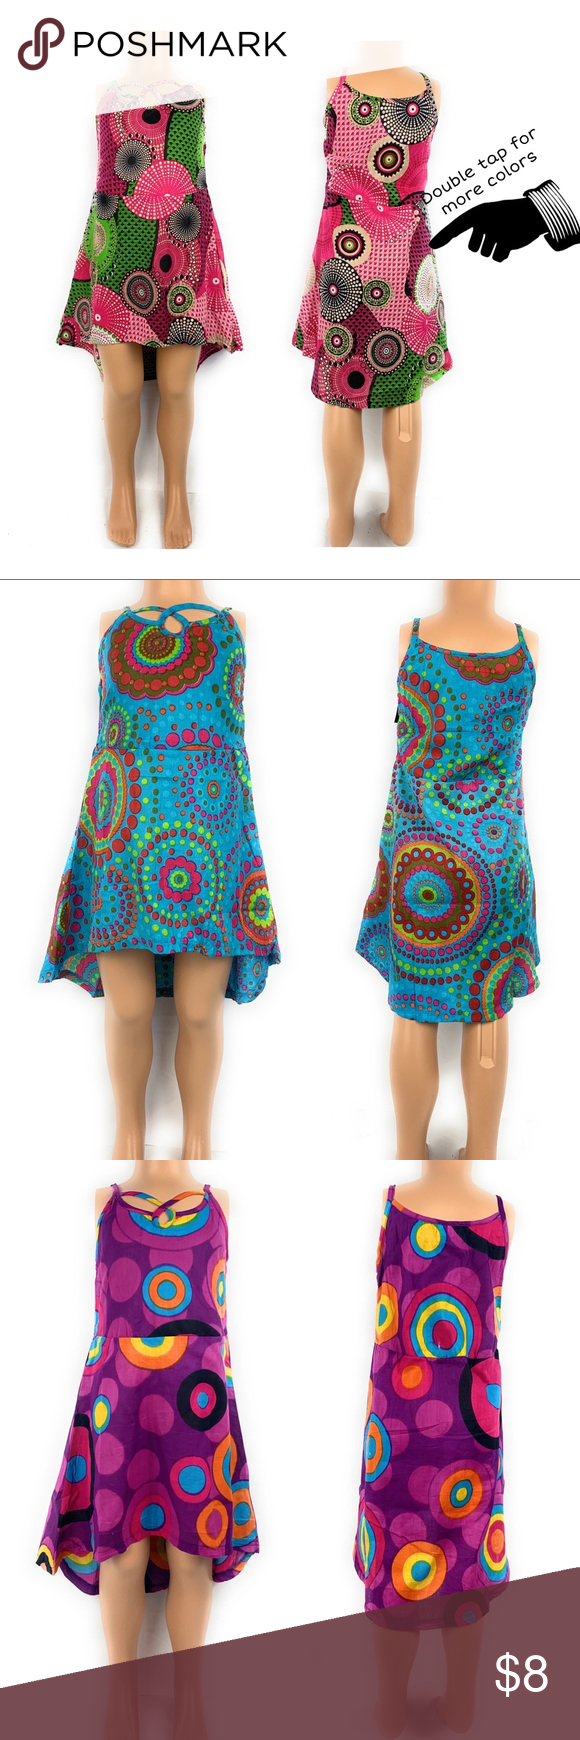 Asymmetrical Summer Dresses Summer Dresses Boutique Dresses Summer Printed Sweater Dress [ 1740 x 580 Pixel ]